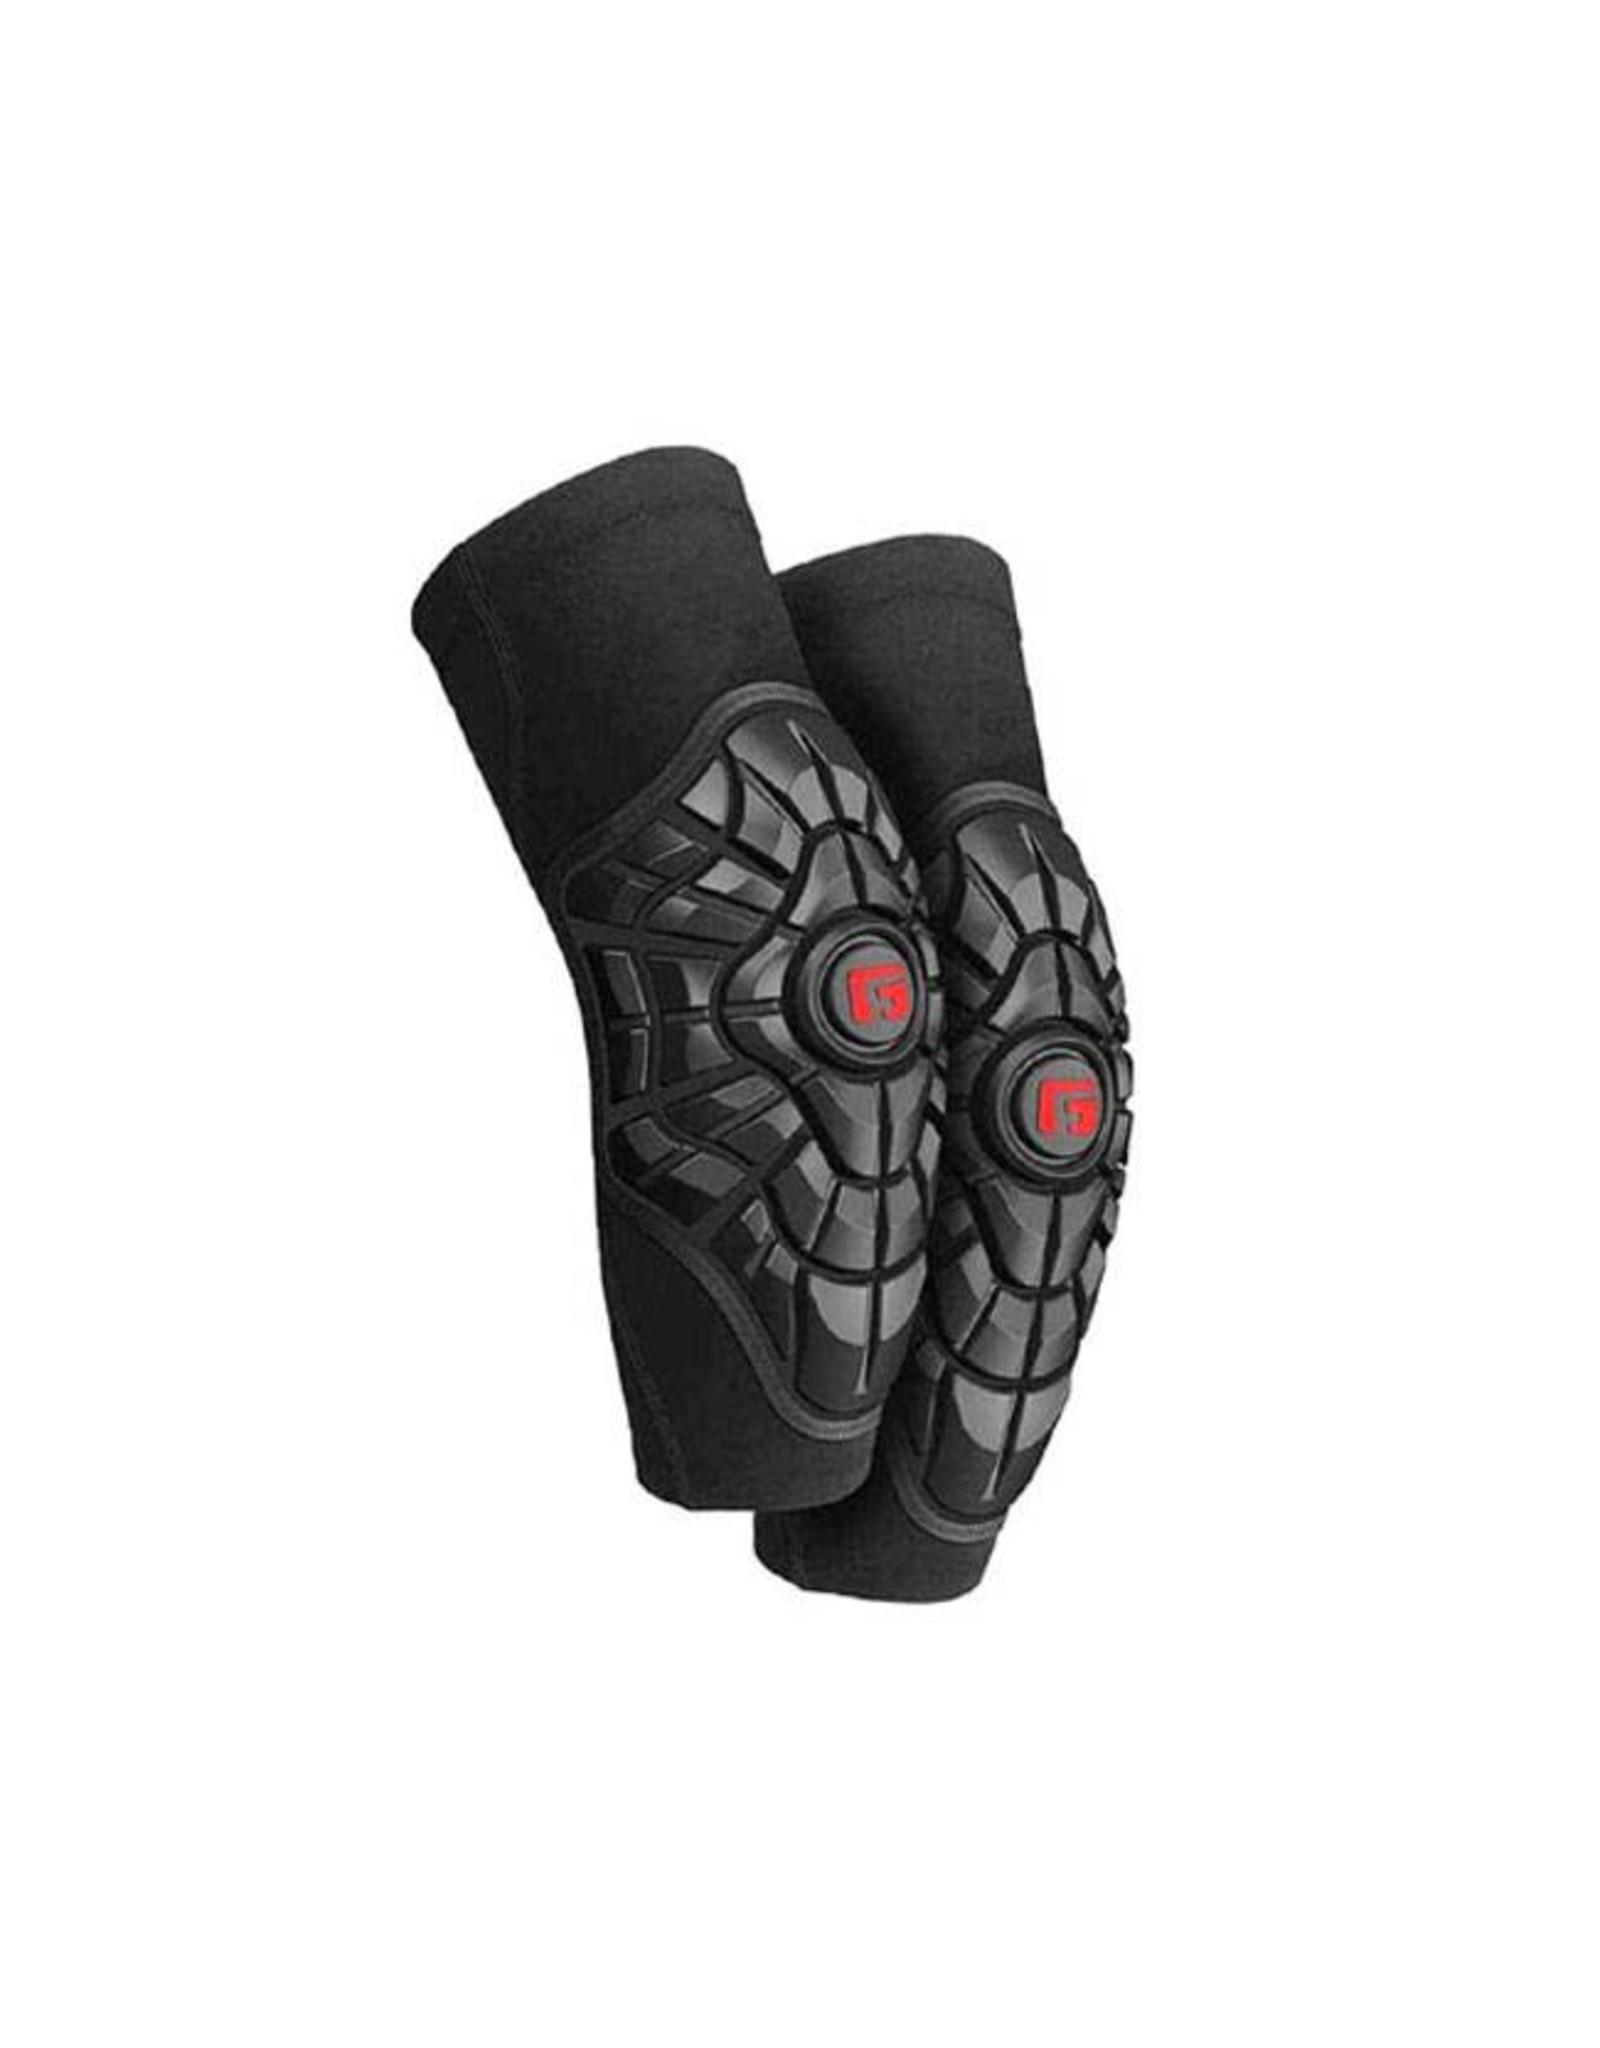 G-Form G-Form Elite Elbow Pad: Black LG